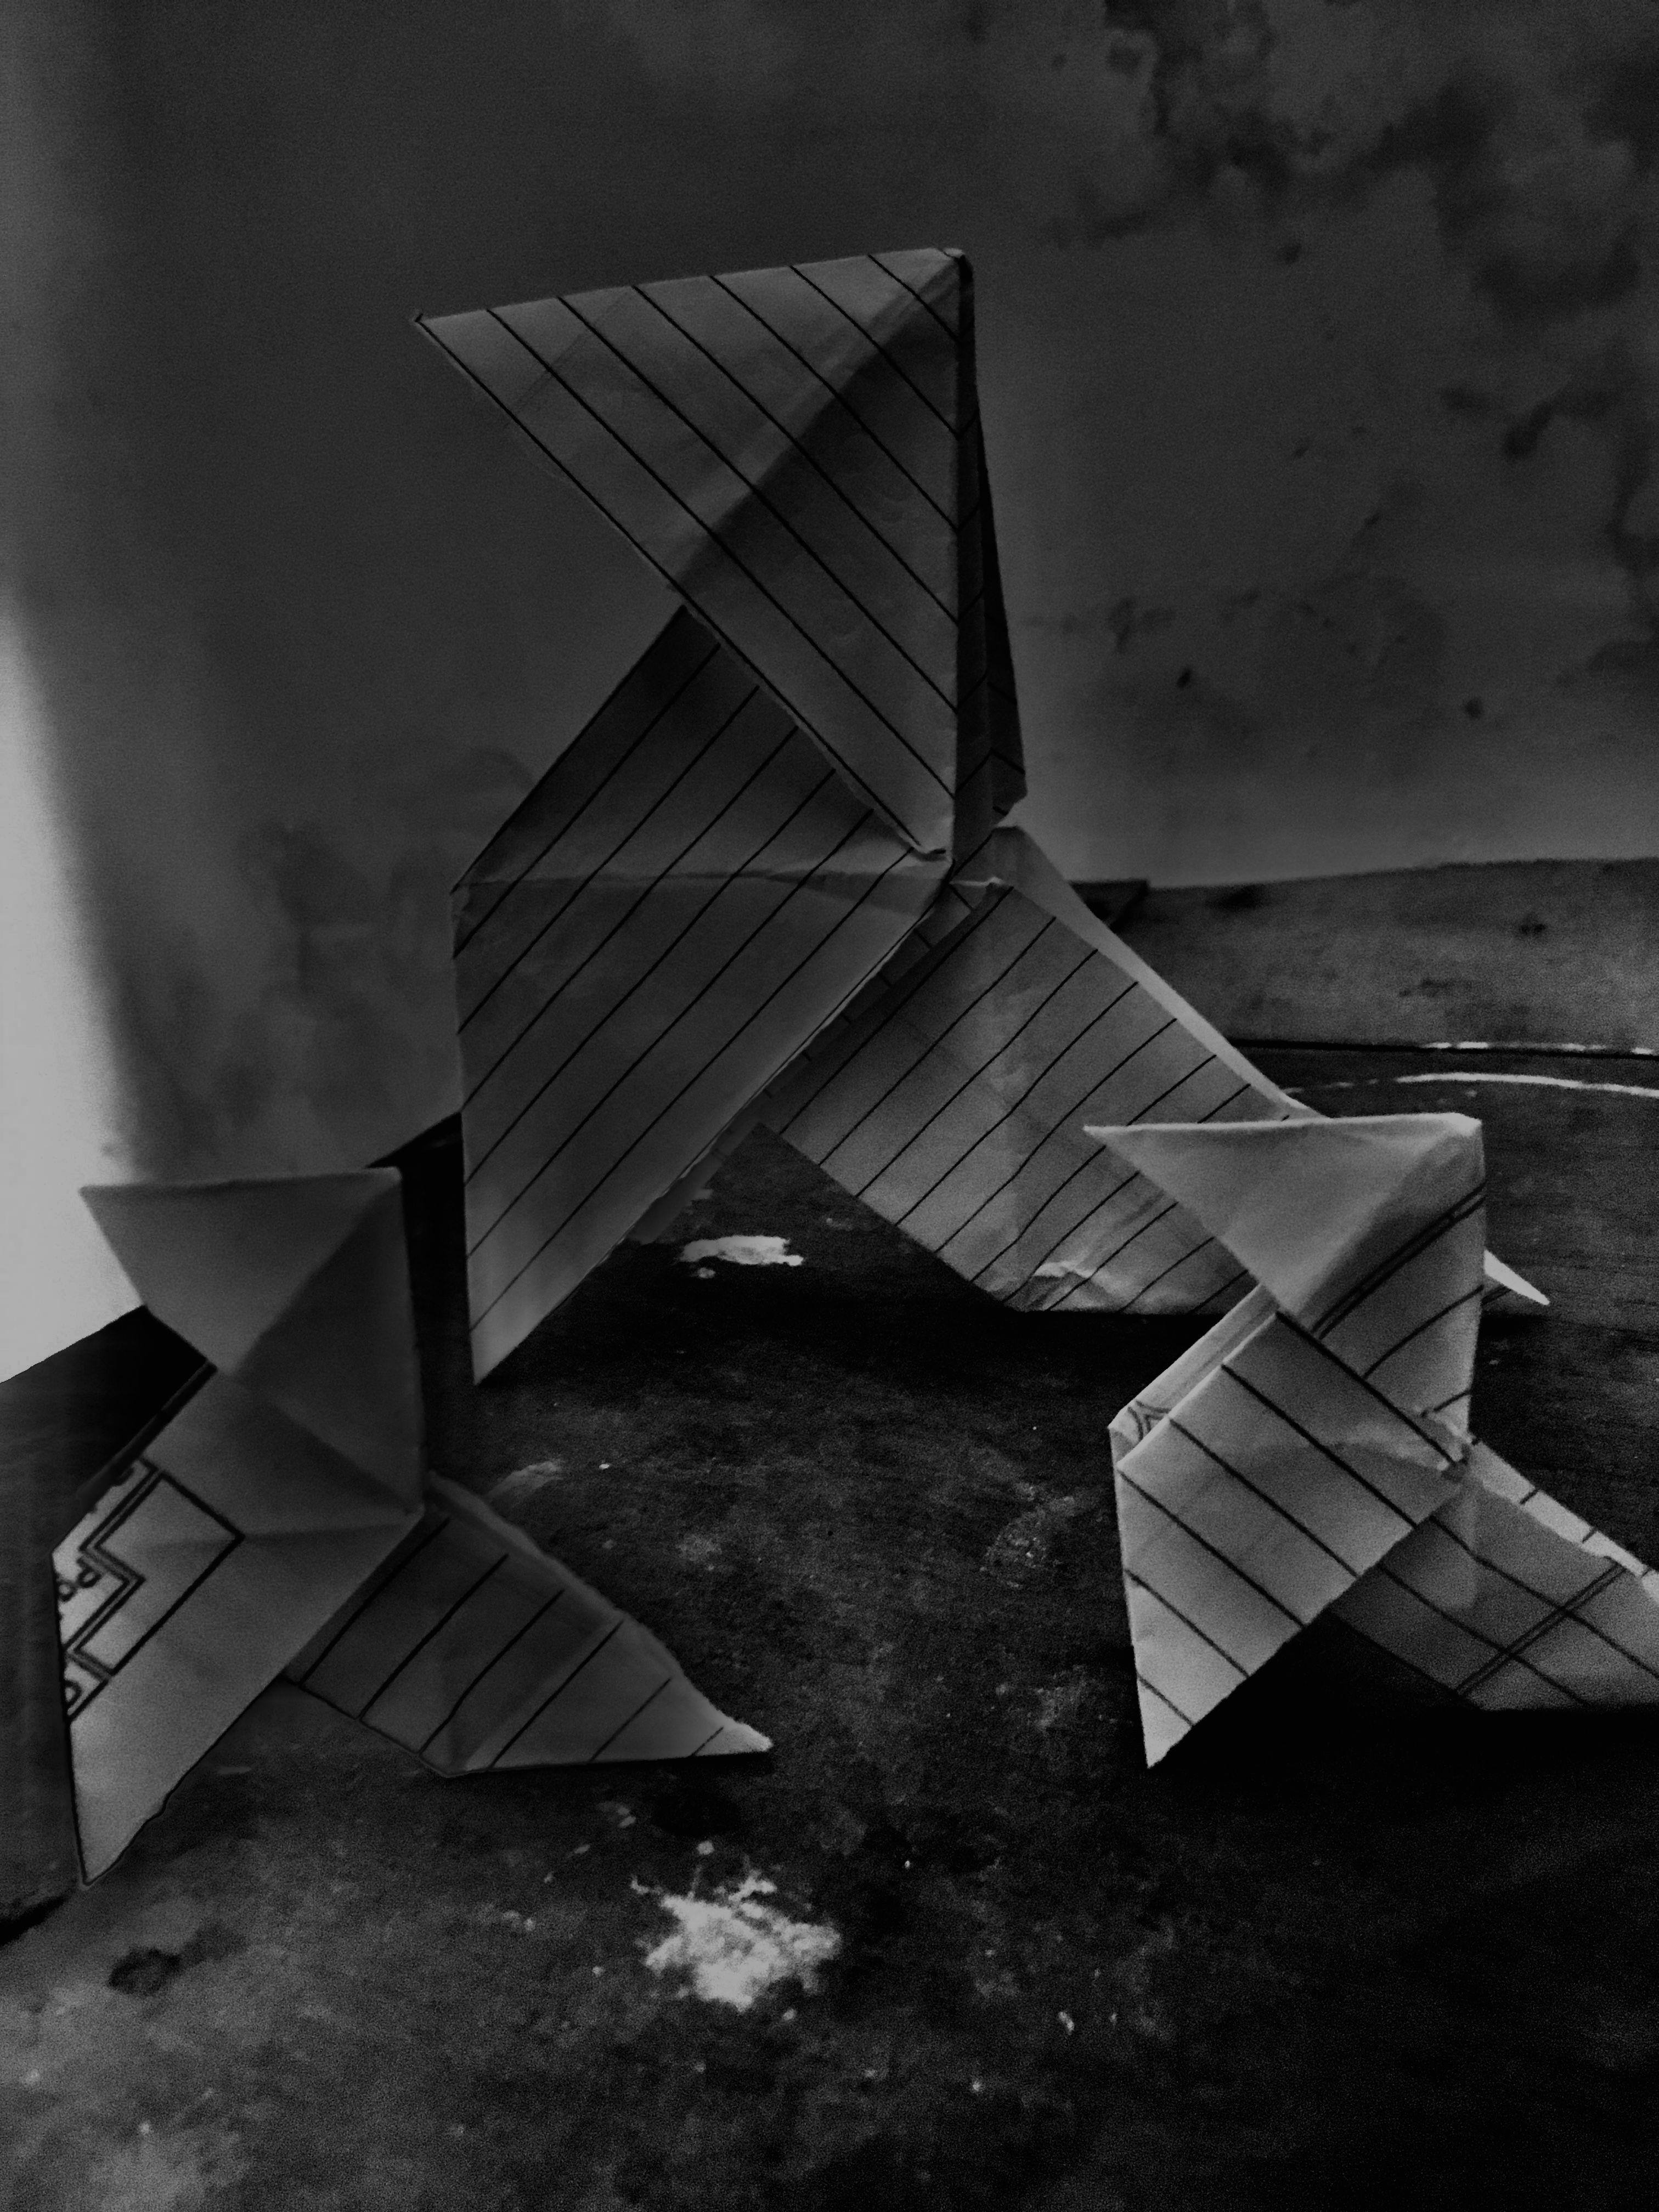 # #moneyheist #origami #wallpaperbackgrounds #wallpaper #originalart #origamiwork #heist #follow4follow #like4like #pinterest  #photography #android #androidwallpaper #iphonewallpaper #origamiartist